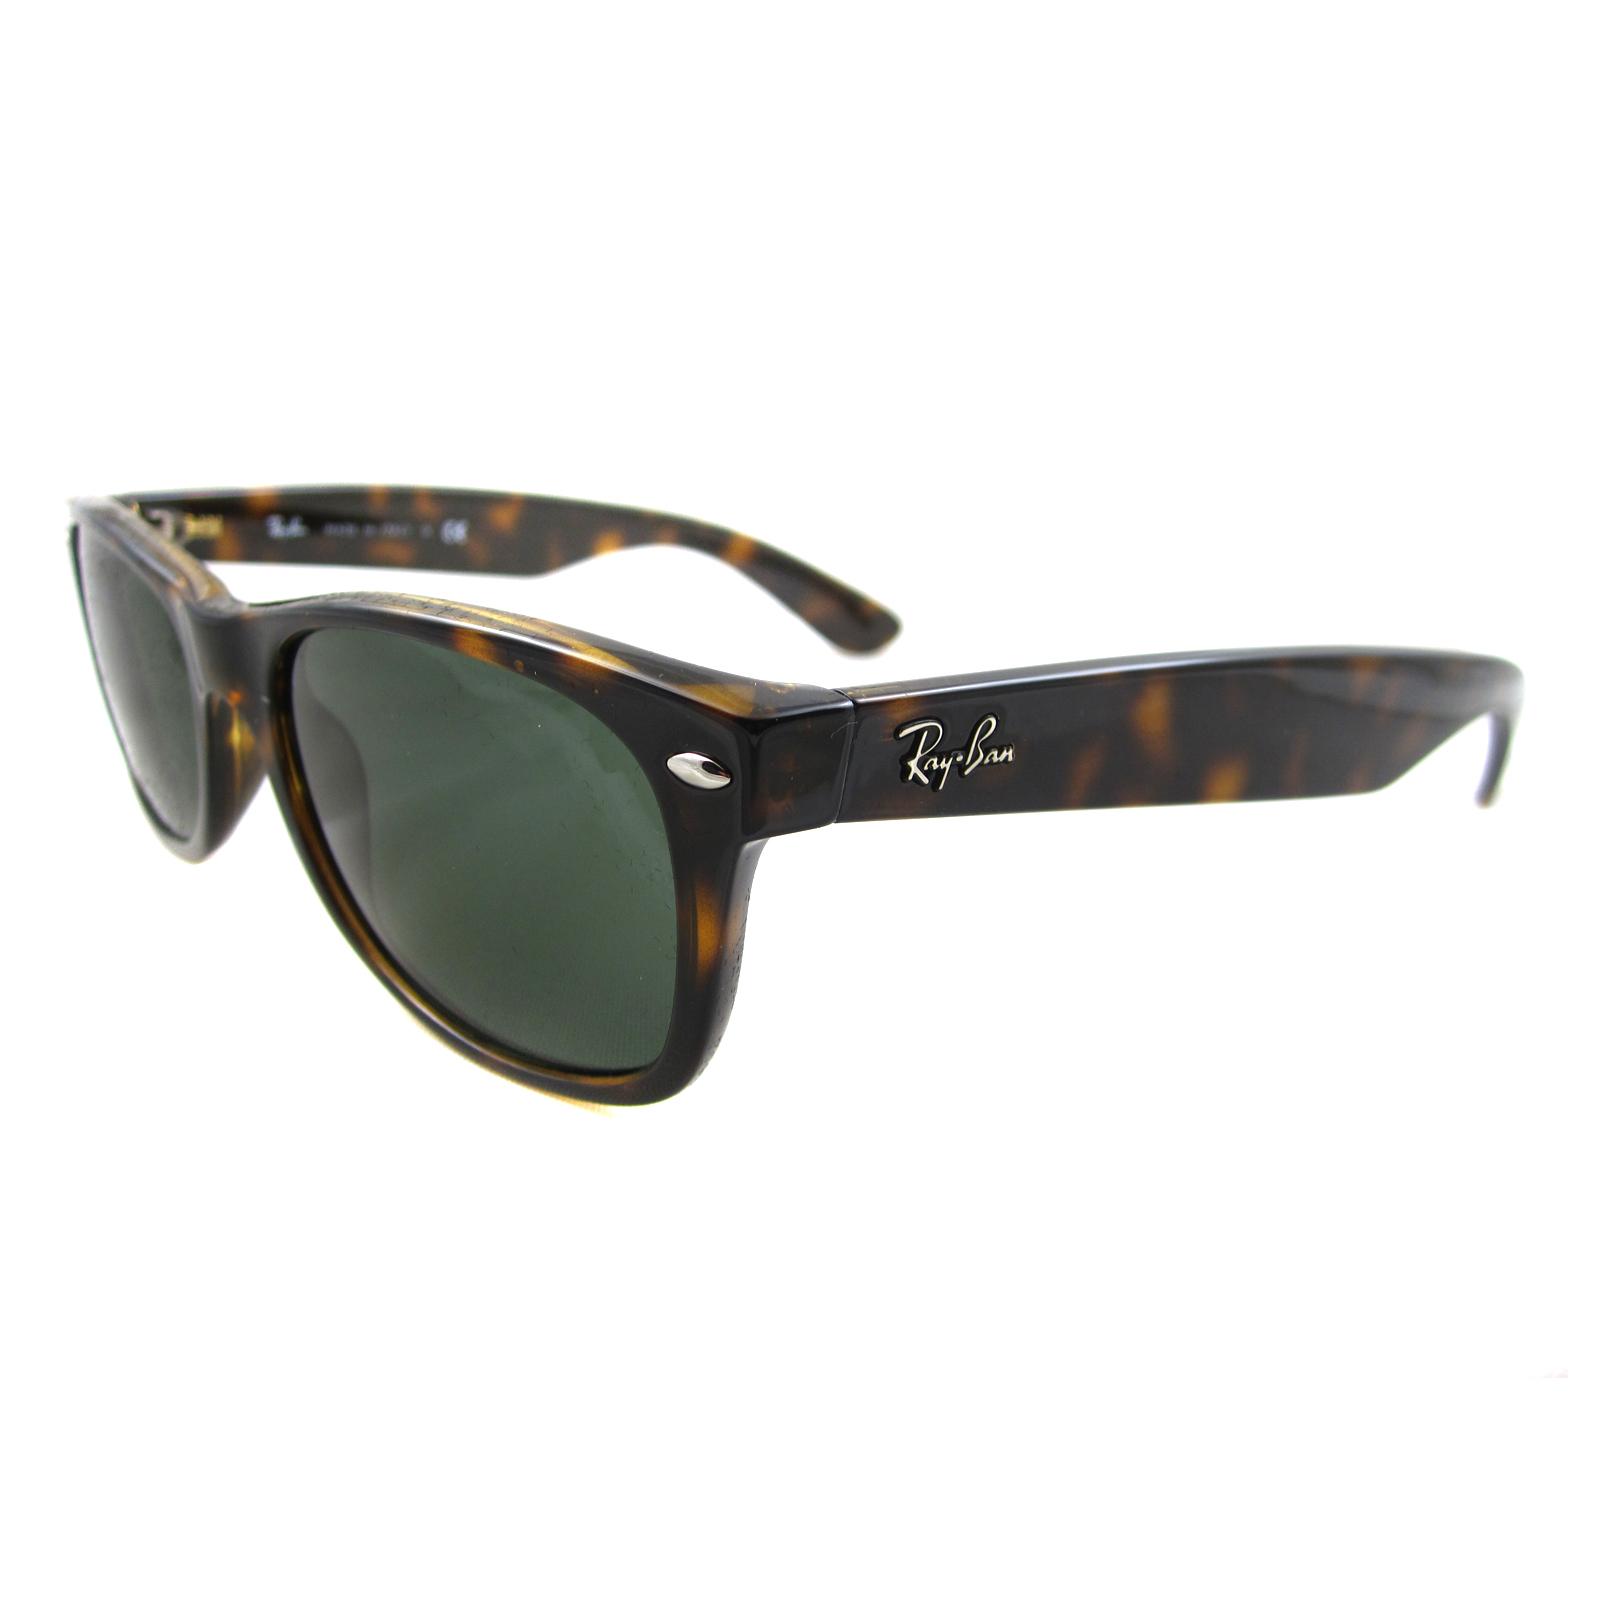 ray ban wayfarer tortoise sale  rayban sunglasses new wayfarer 2132 902 tortoise 52mm